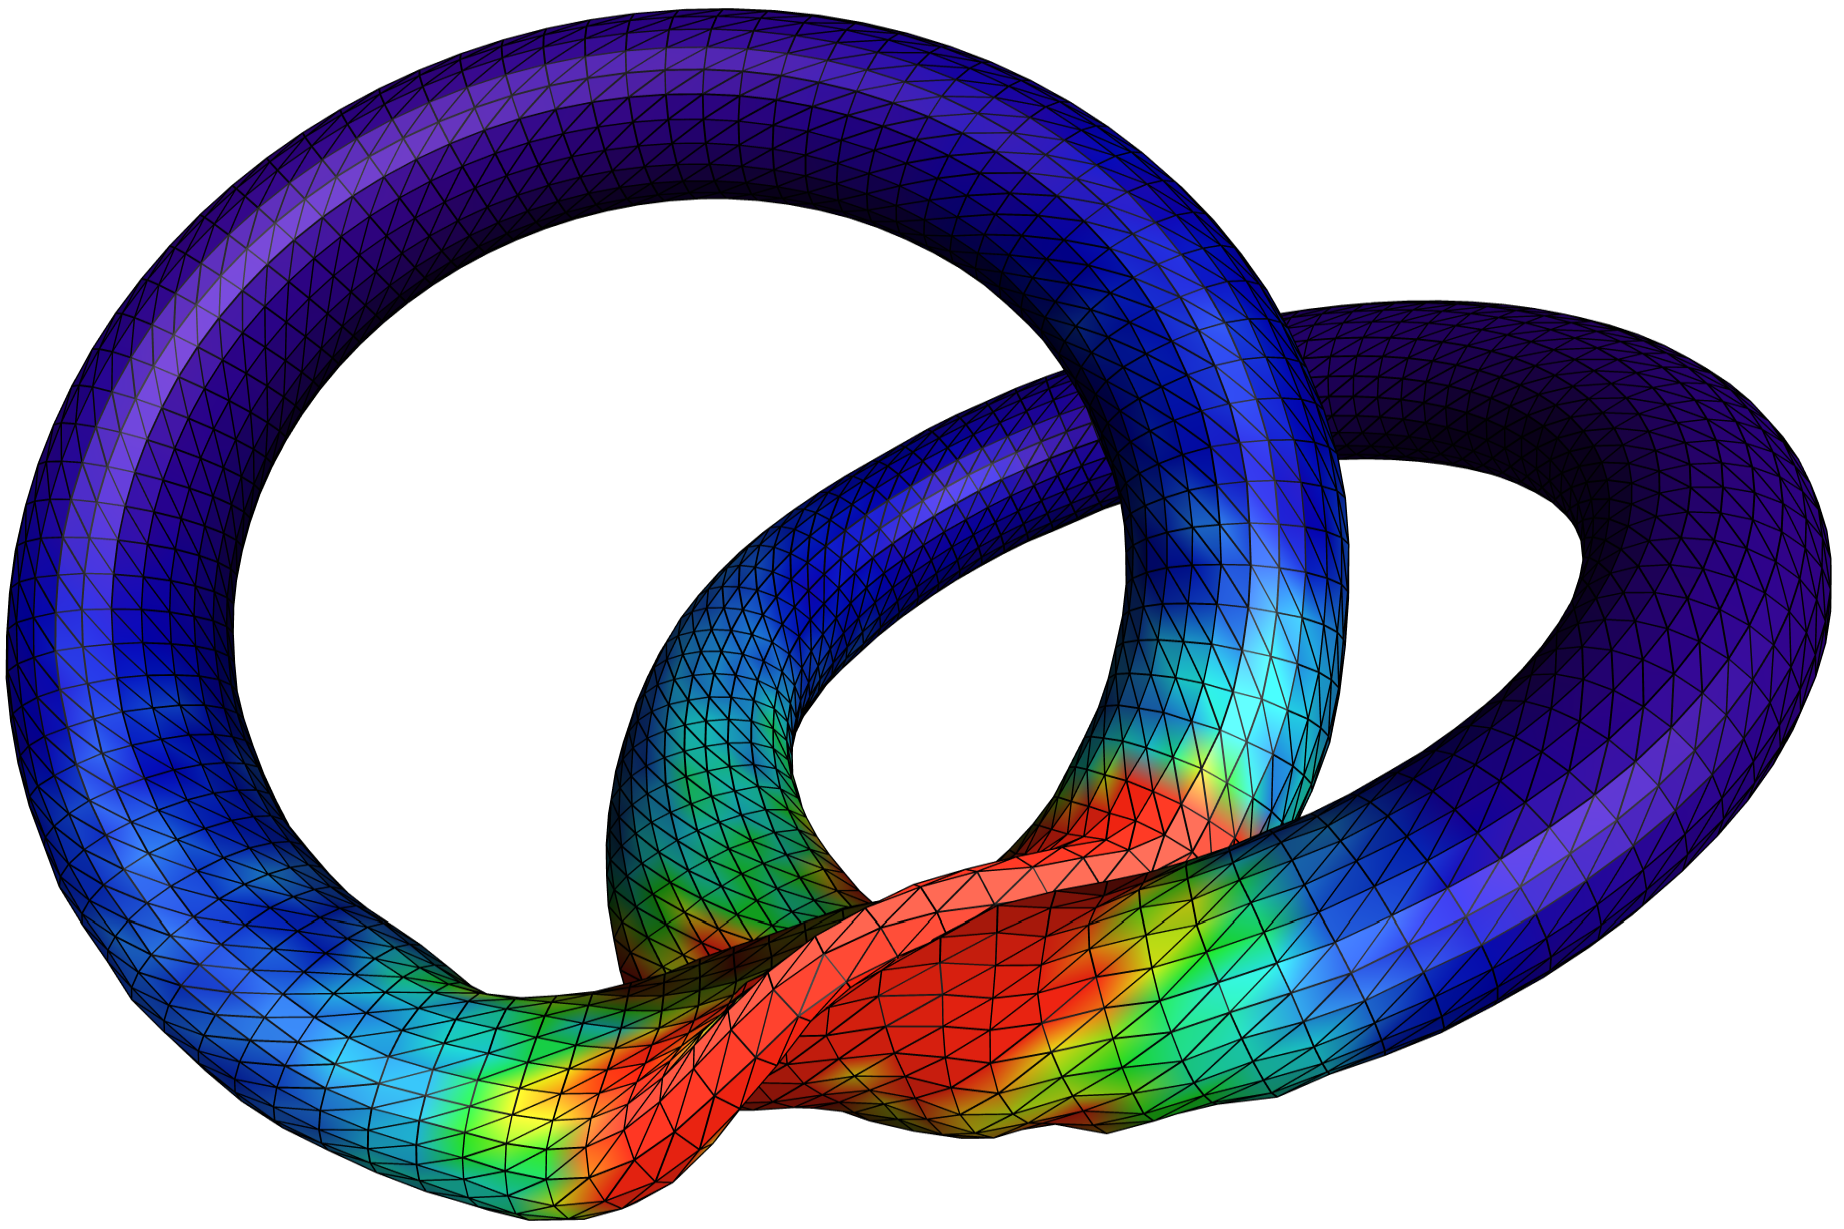 static/img/example-large-deformation-torus.png